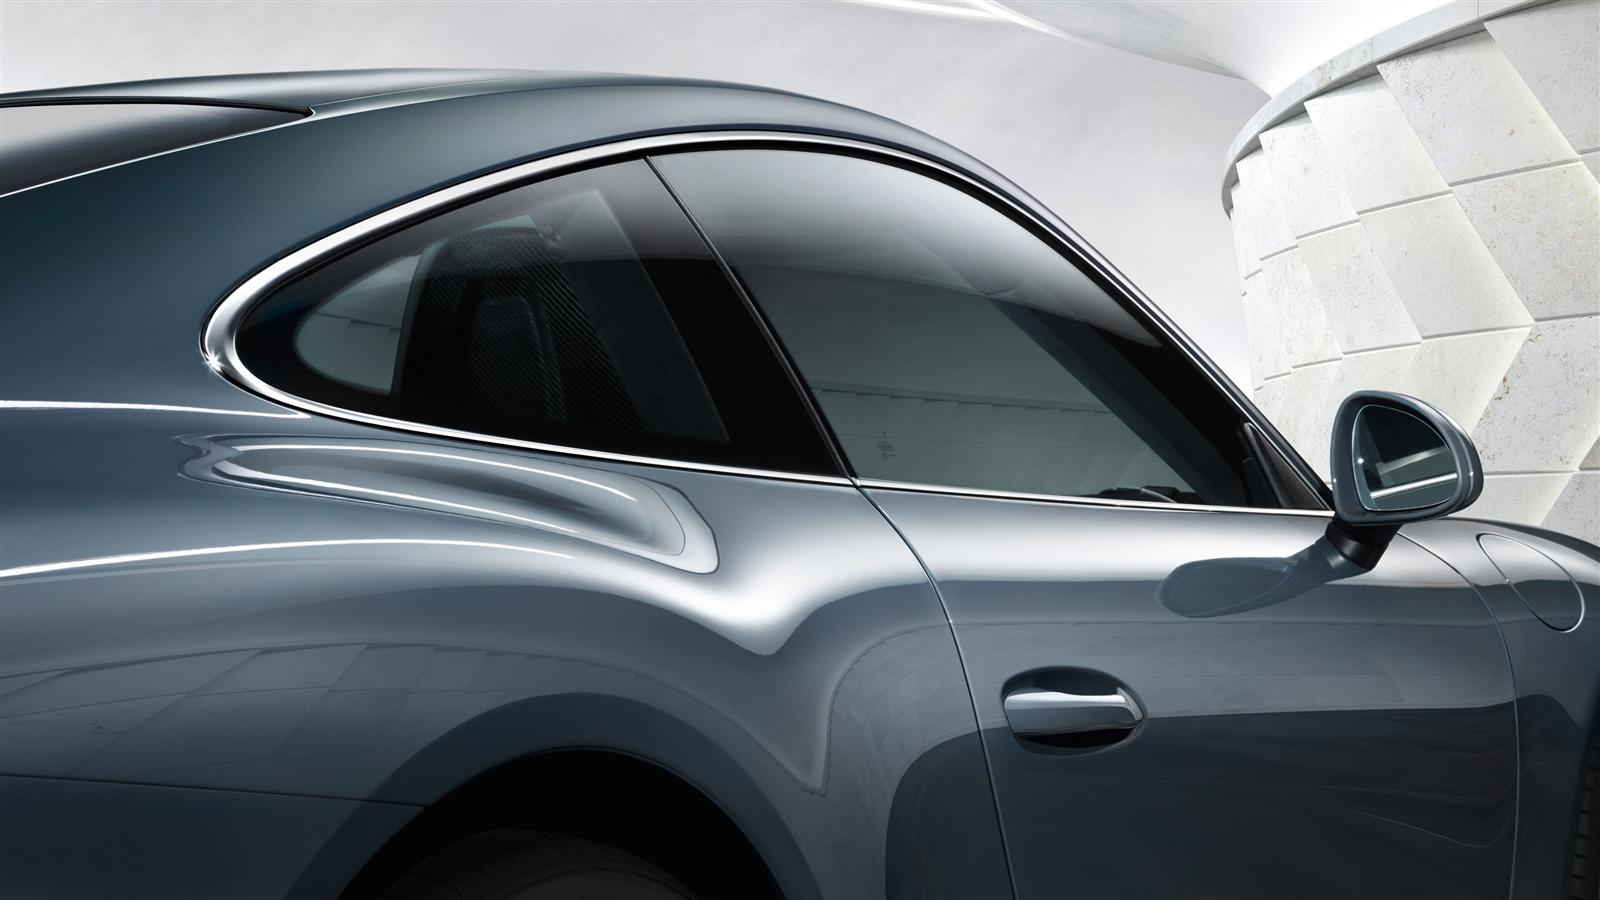 porsche 911 carrera specs 2015 2016 2017 2018 autoevolution. Black Bedroom Furniture Sets. Home Design Ideas